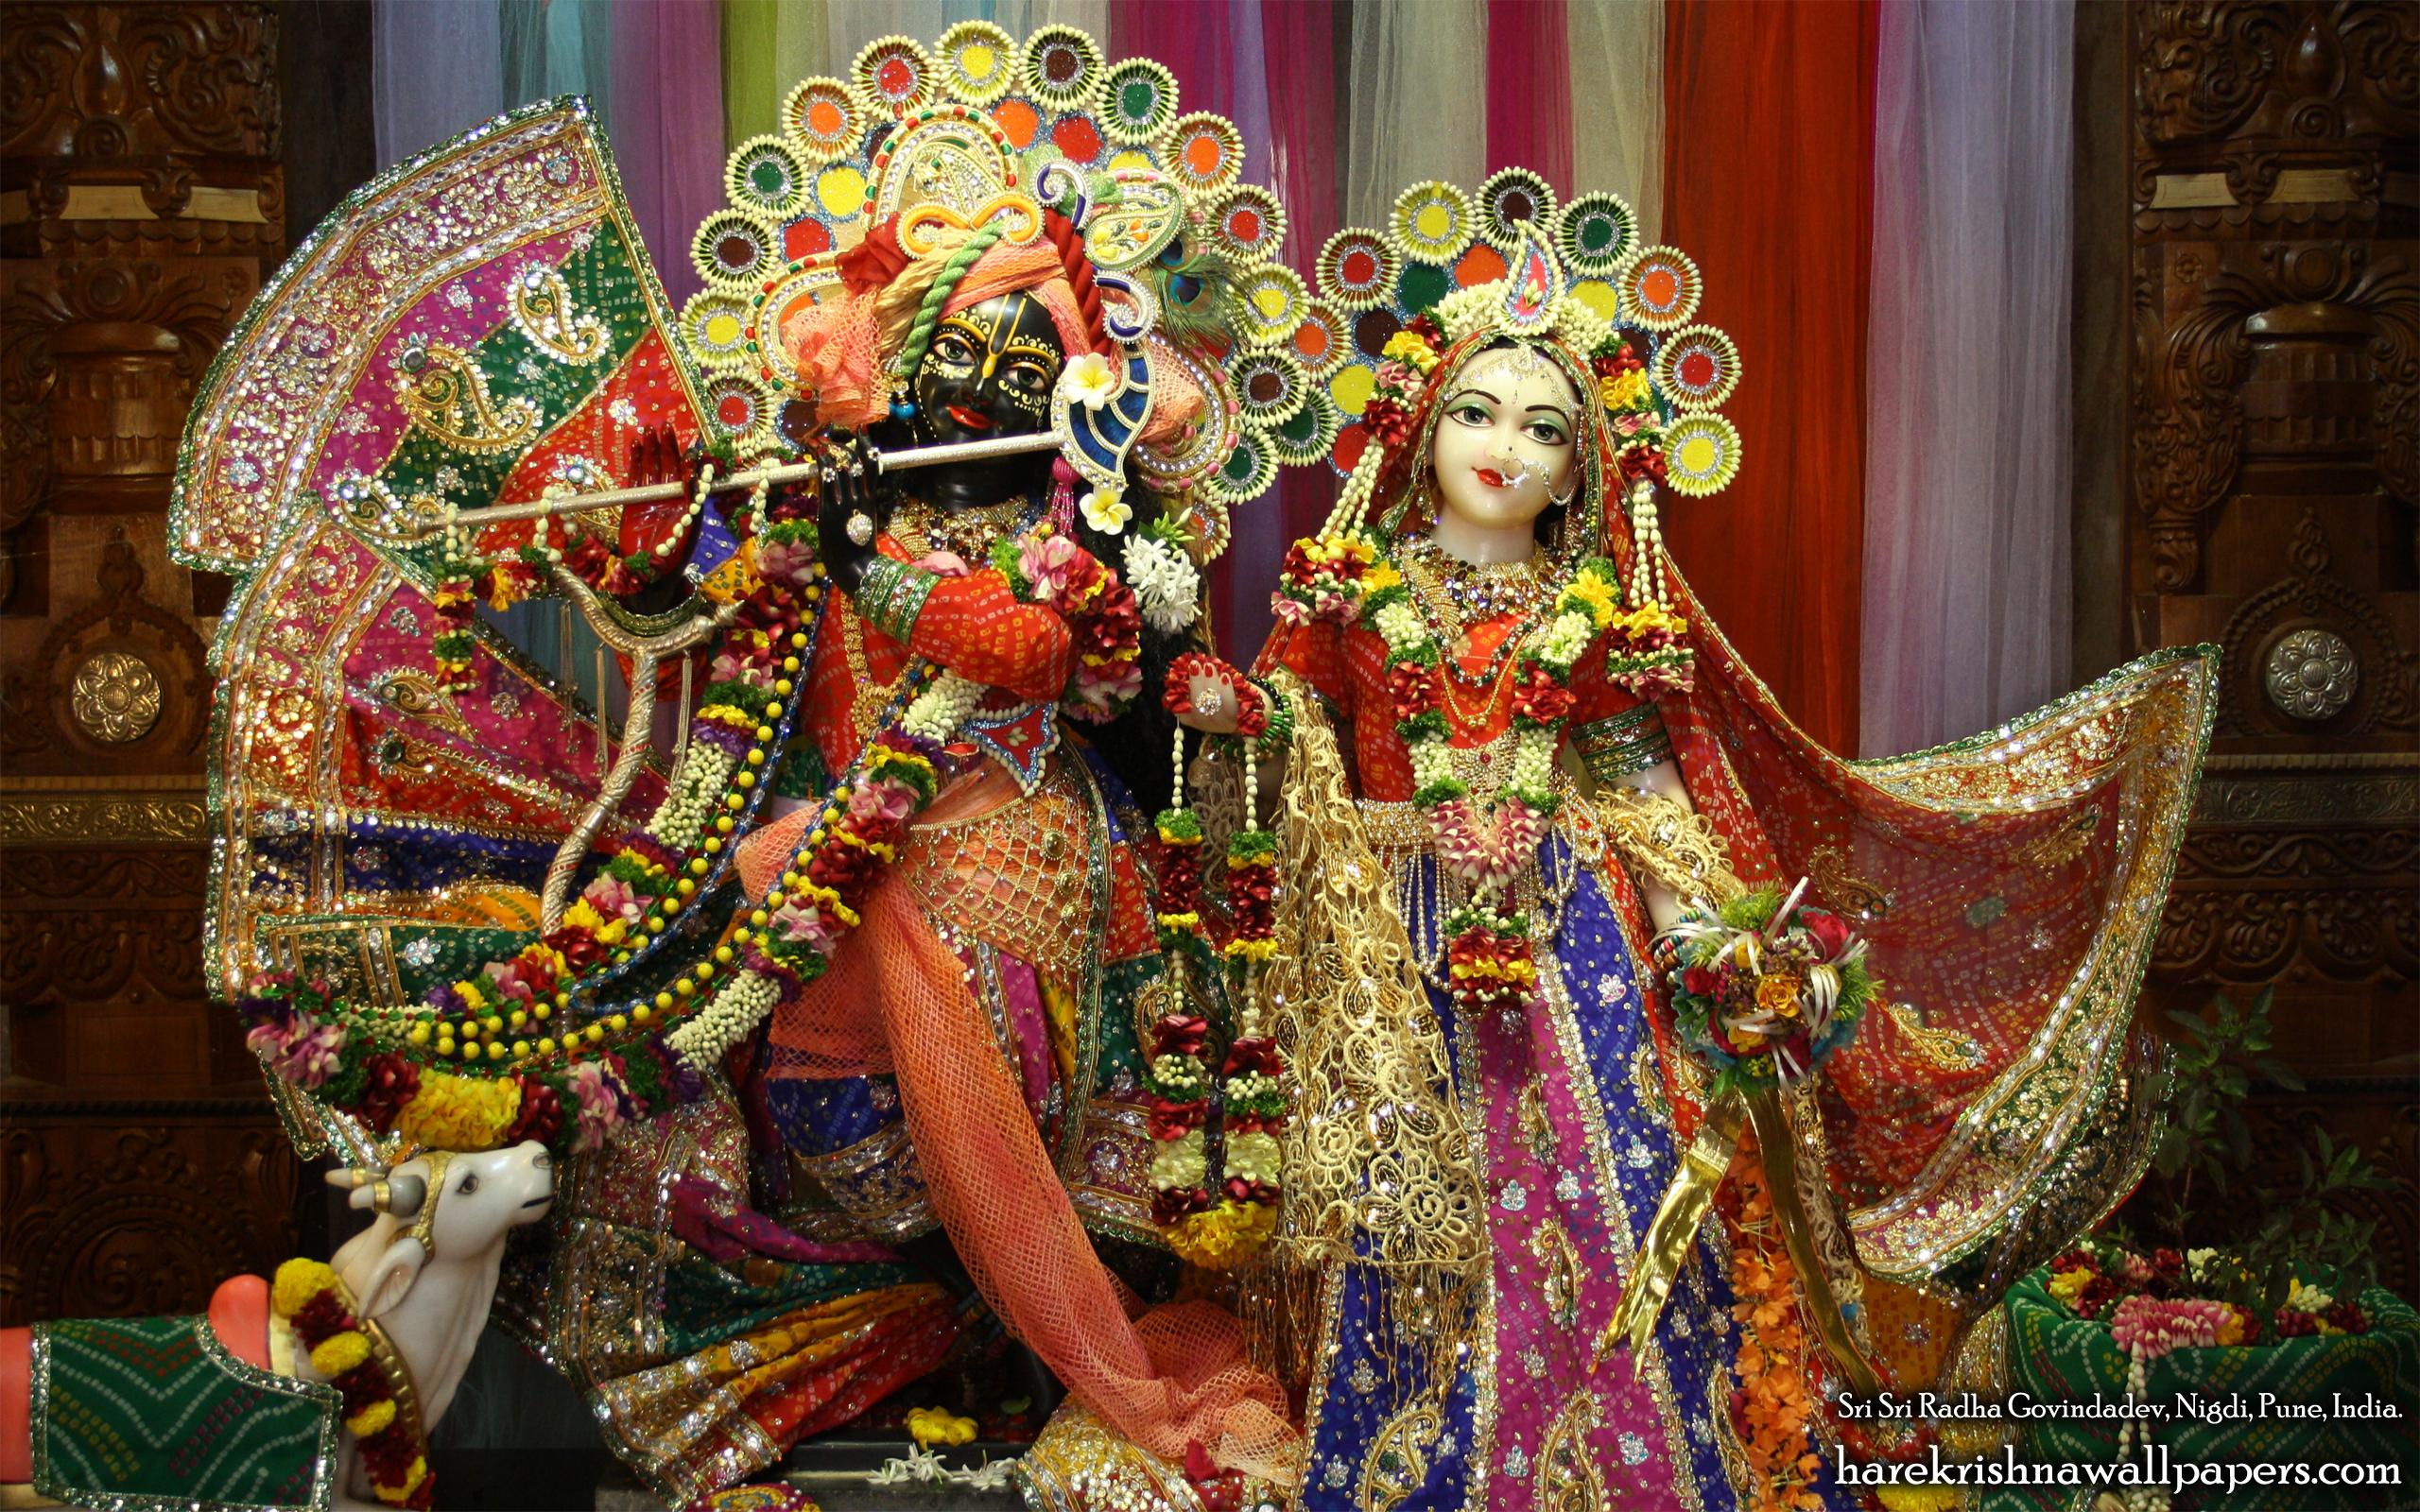 Sri Sri Radha Govind Wallpaper (036) Size 2560x1600 Download